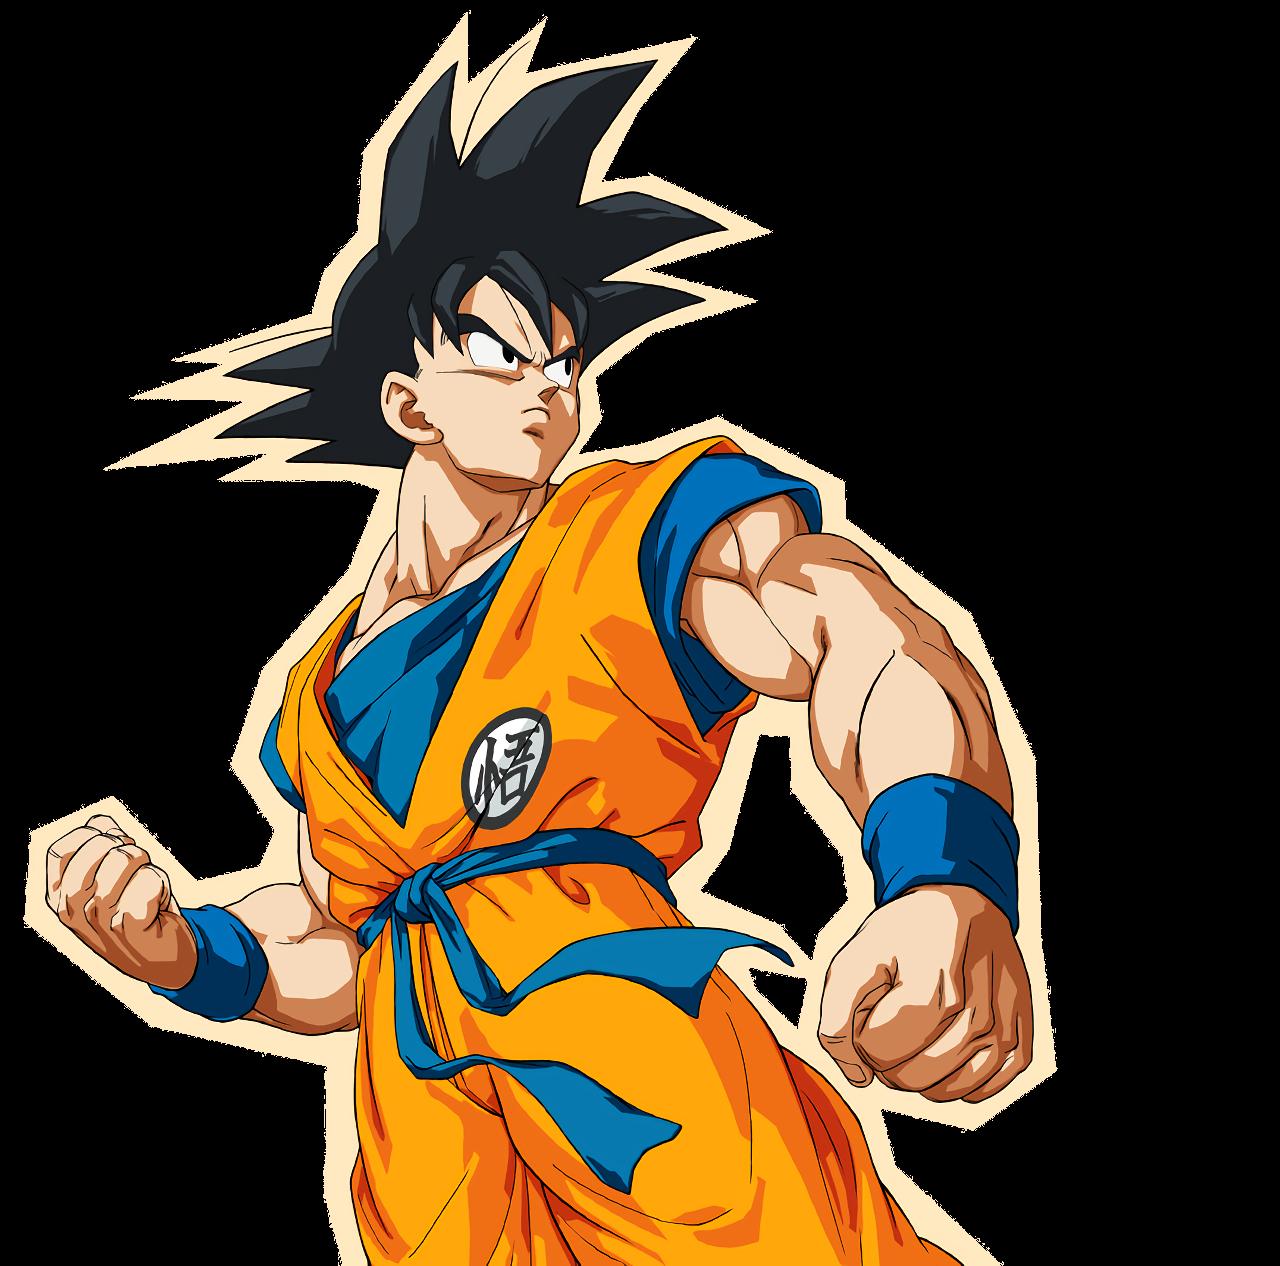 Son Goku Render Dbz Kakarot By Maxiuchiha22 On Deviantart Dragon Ball Super Manga Anime Dragon Ball Super Dragon Ball Art